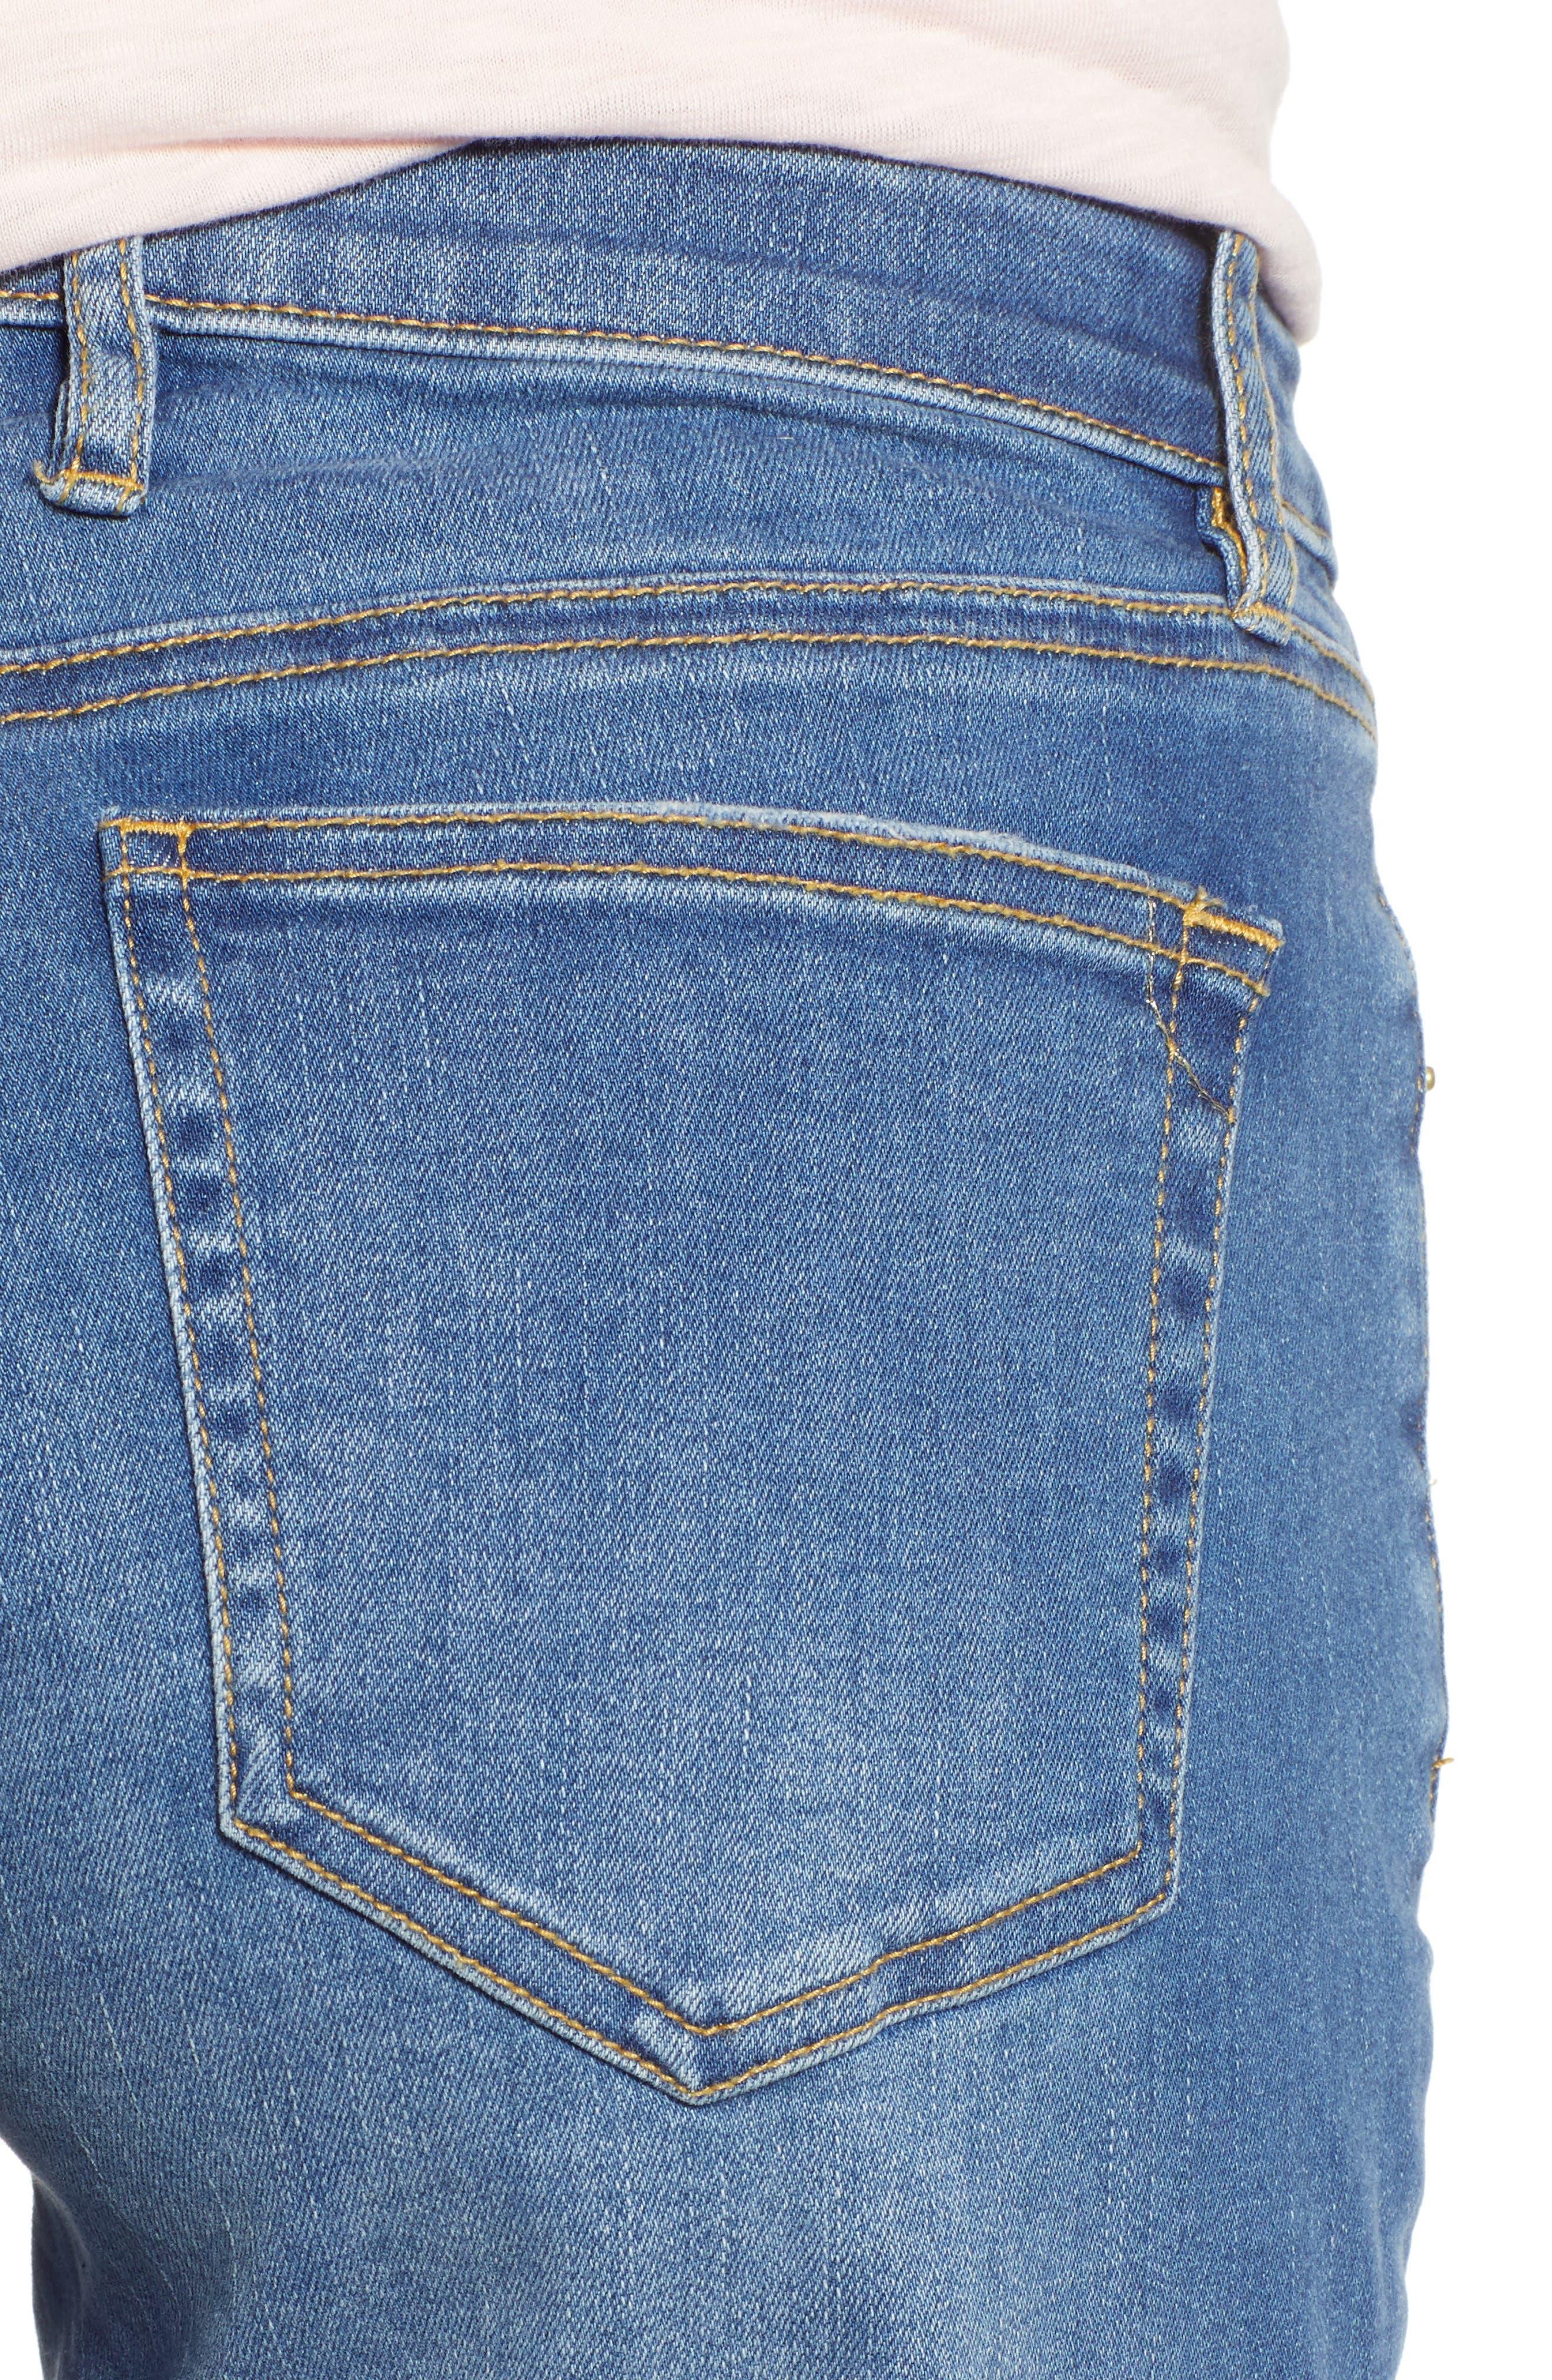 TOMMY BAHAMA, Tema Slim Boyfriend Jeans, Alternate thumbnail 5, color, DARK INDIGO WASH